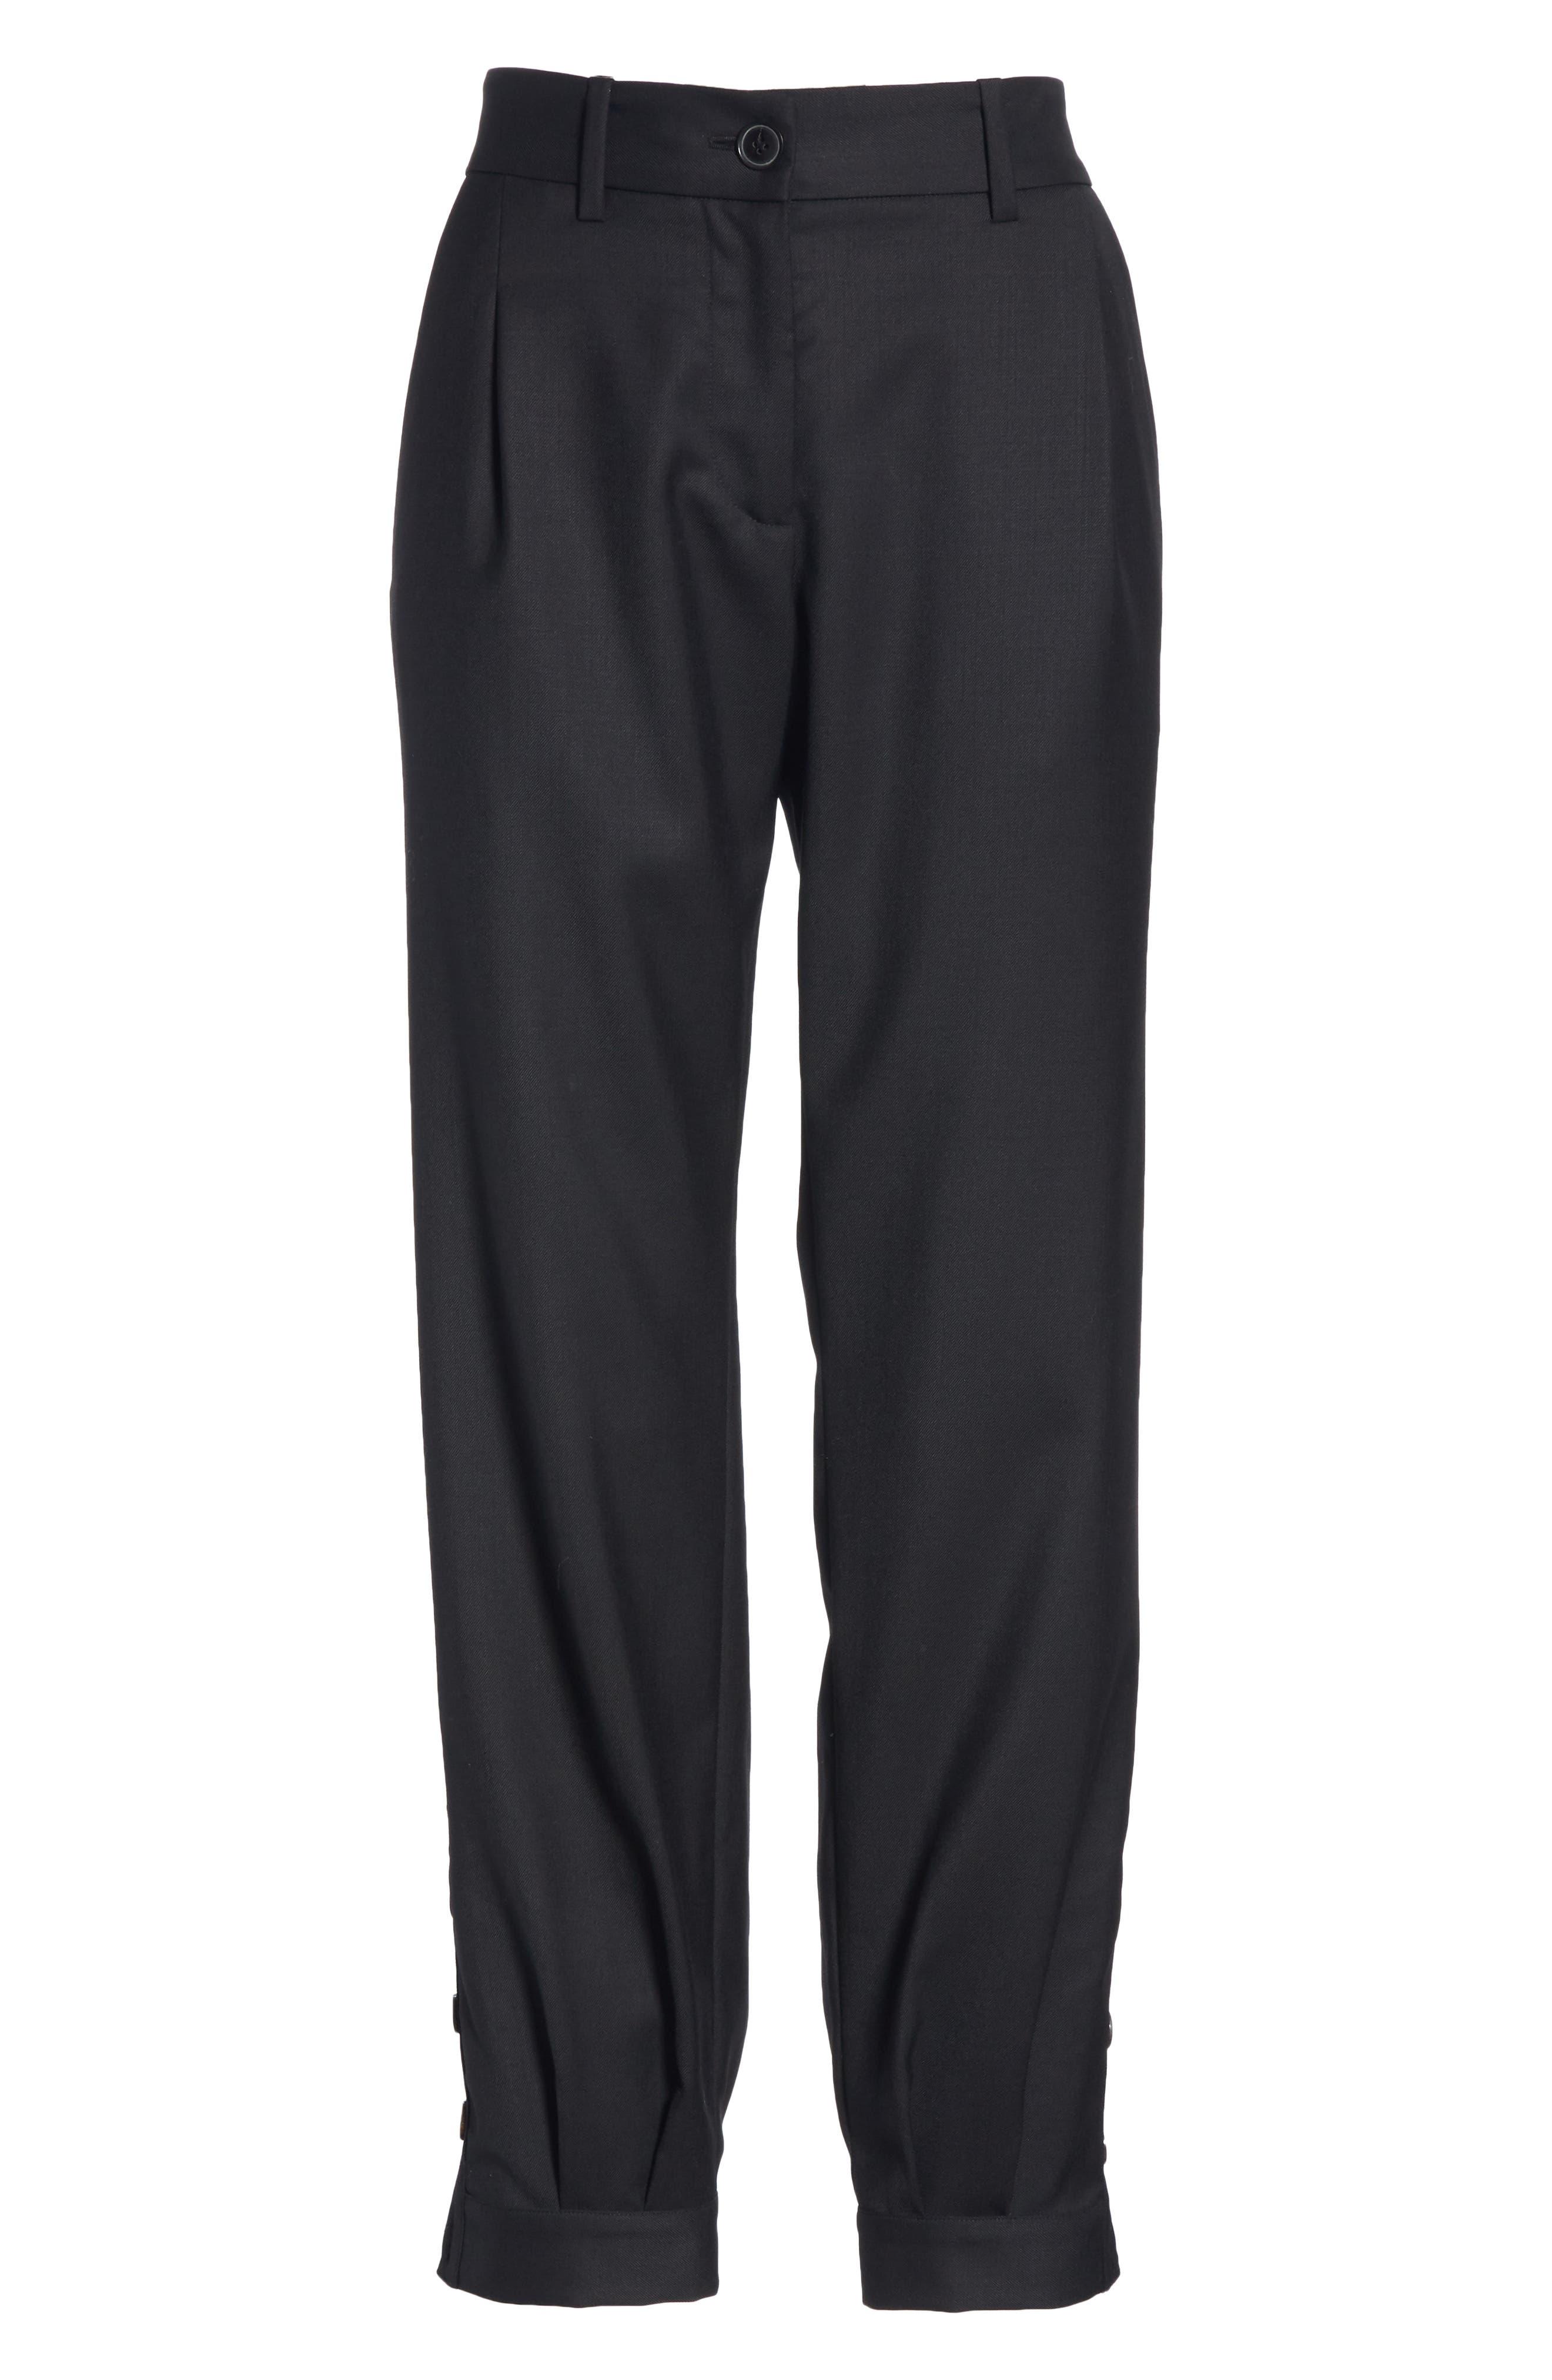 NILI LOTAN, Bertina Pleated Wool Crop Pants, Alternate thumbnail 7, color, BLACK